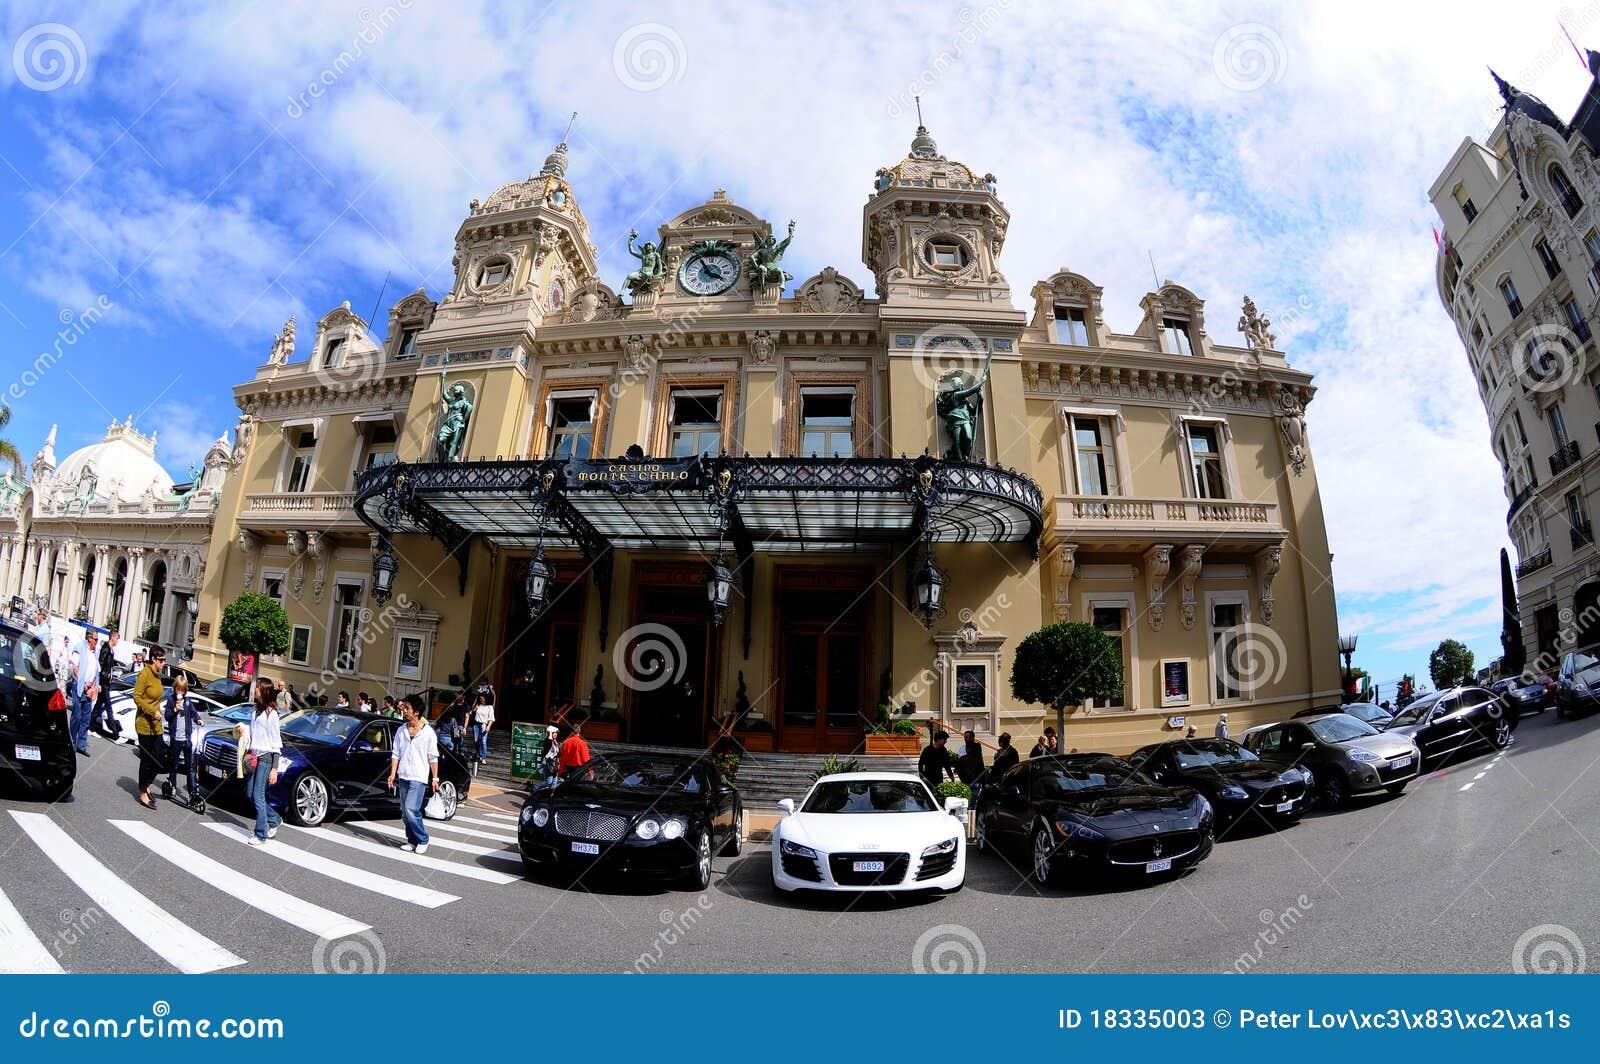 Monte carlo casino entrance casino regina restaurant